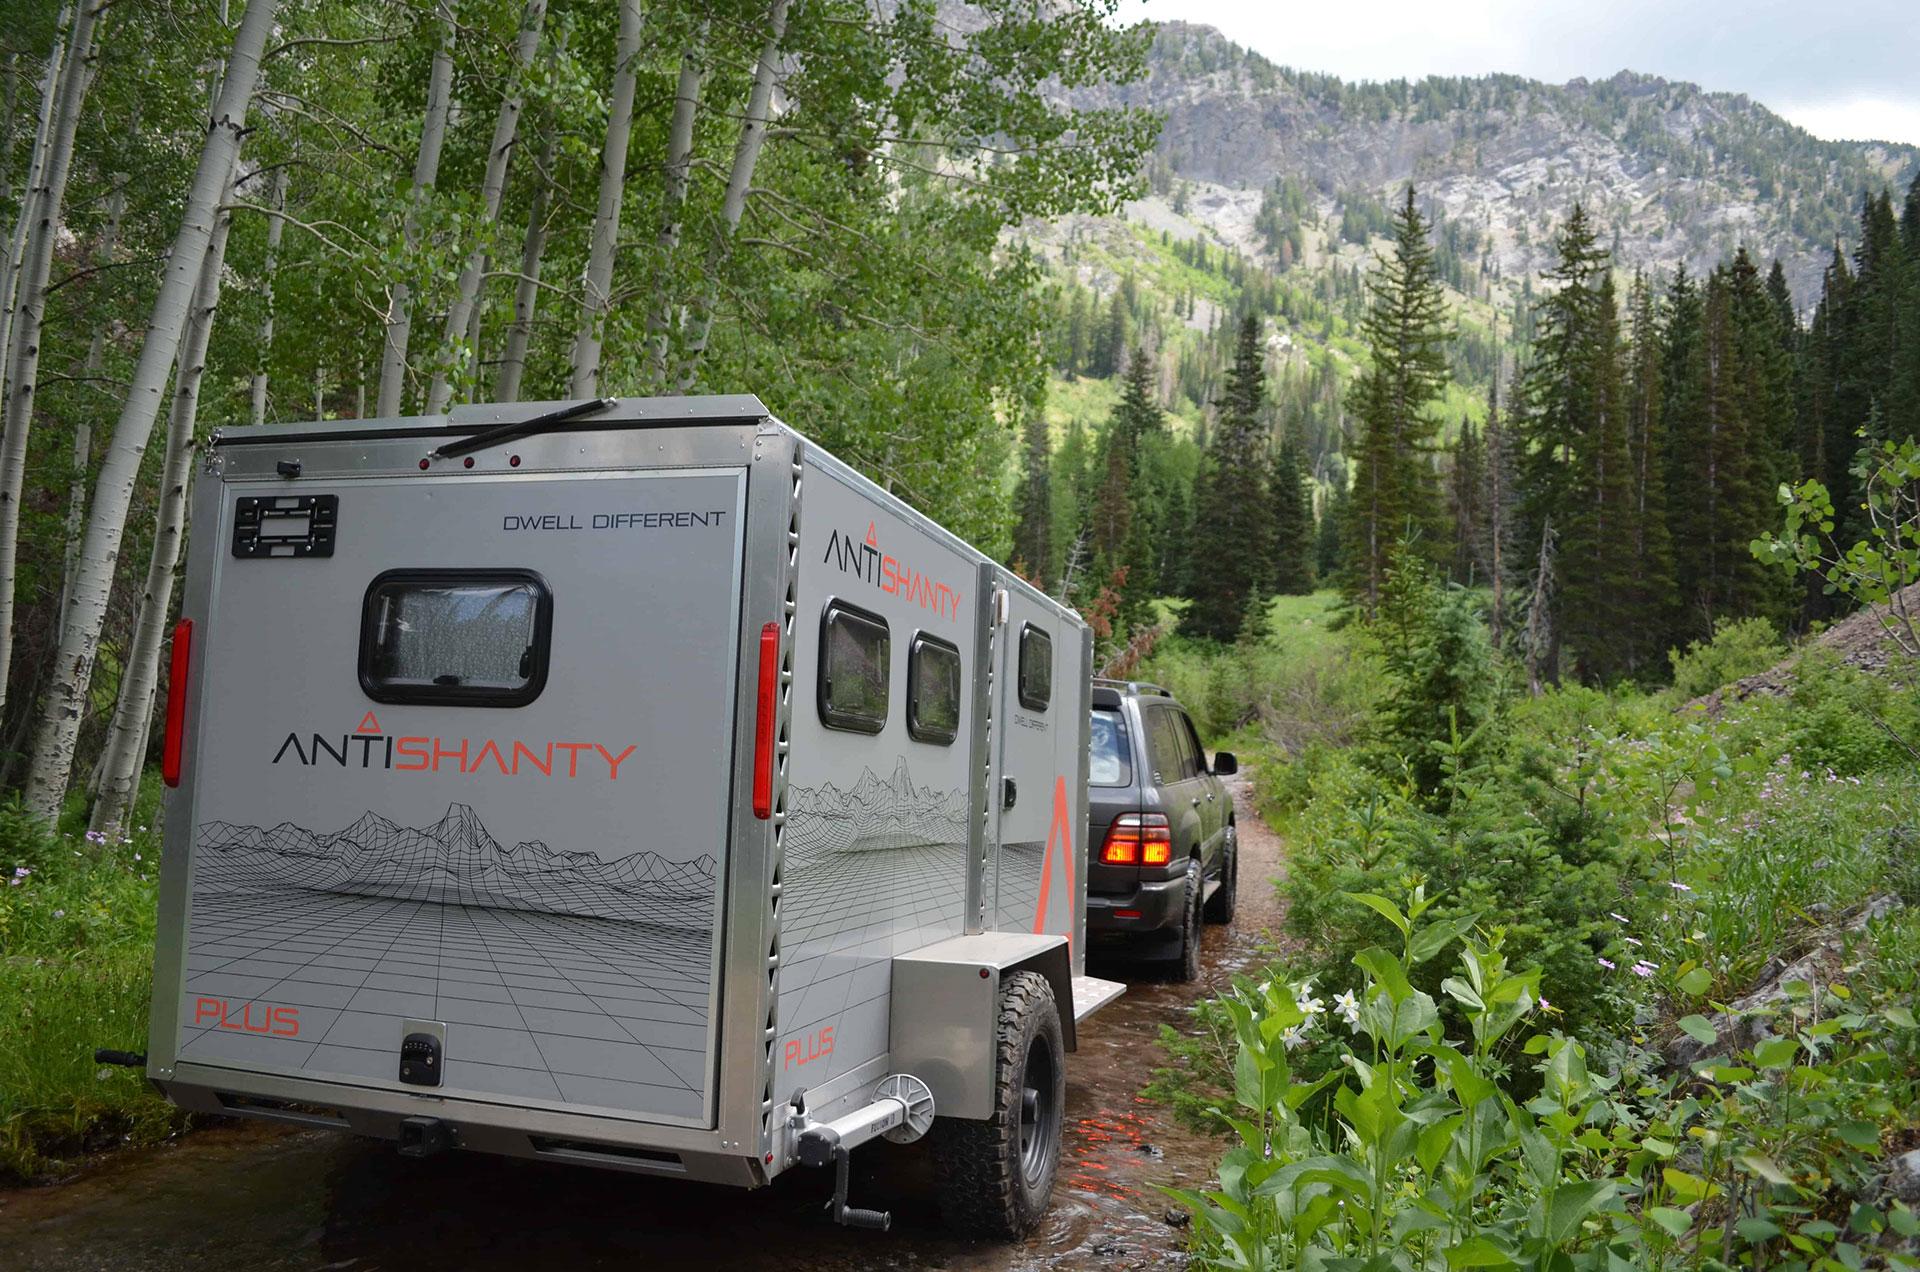 AntiShanty Camping Trailer